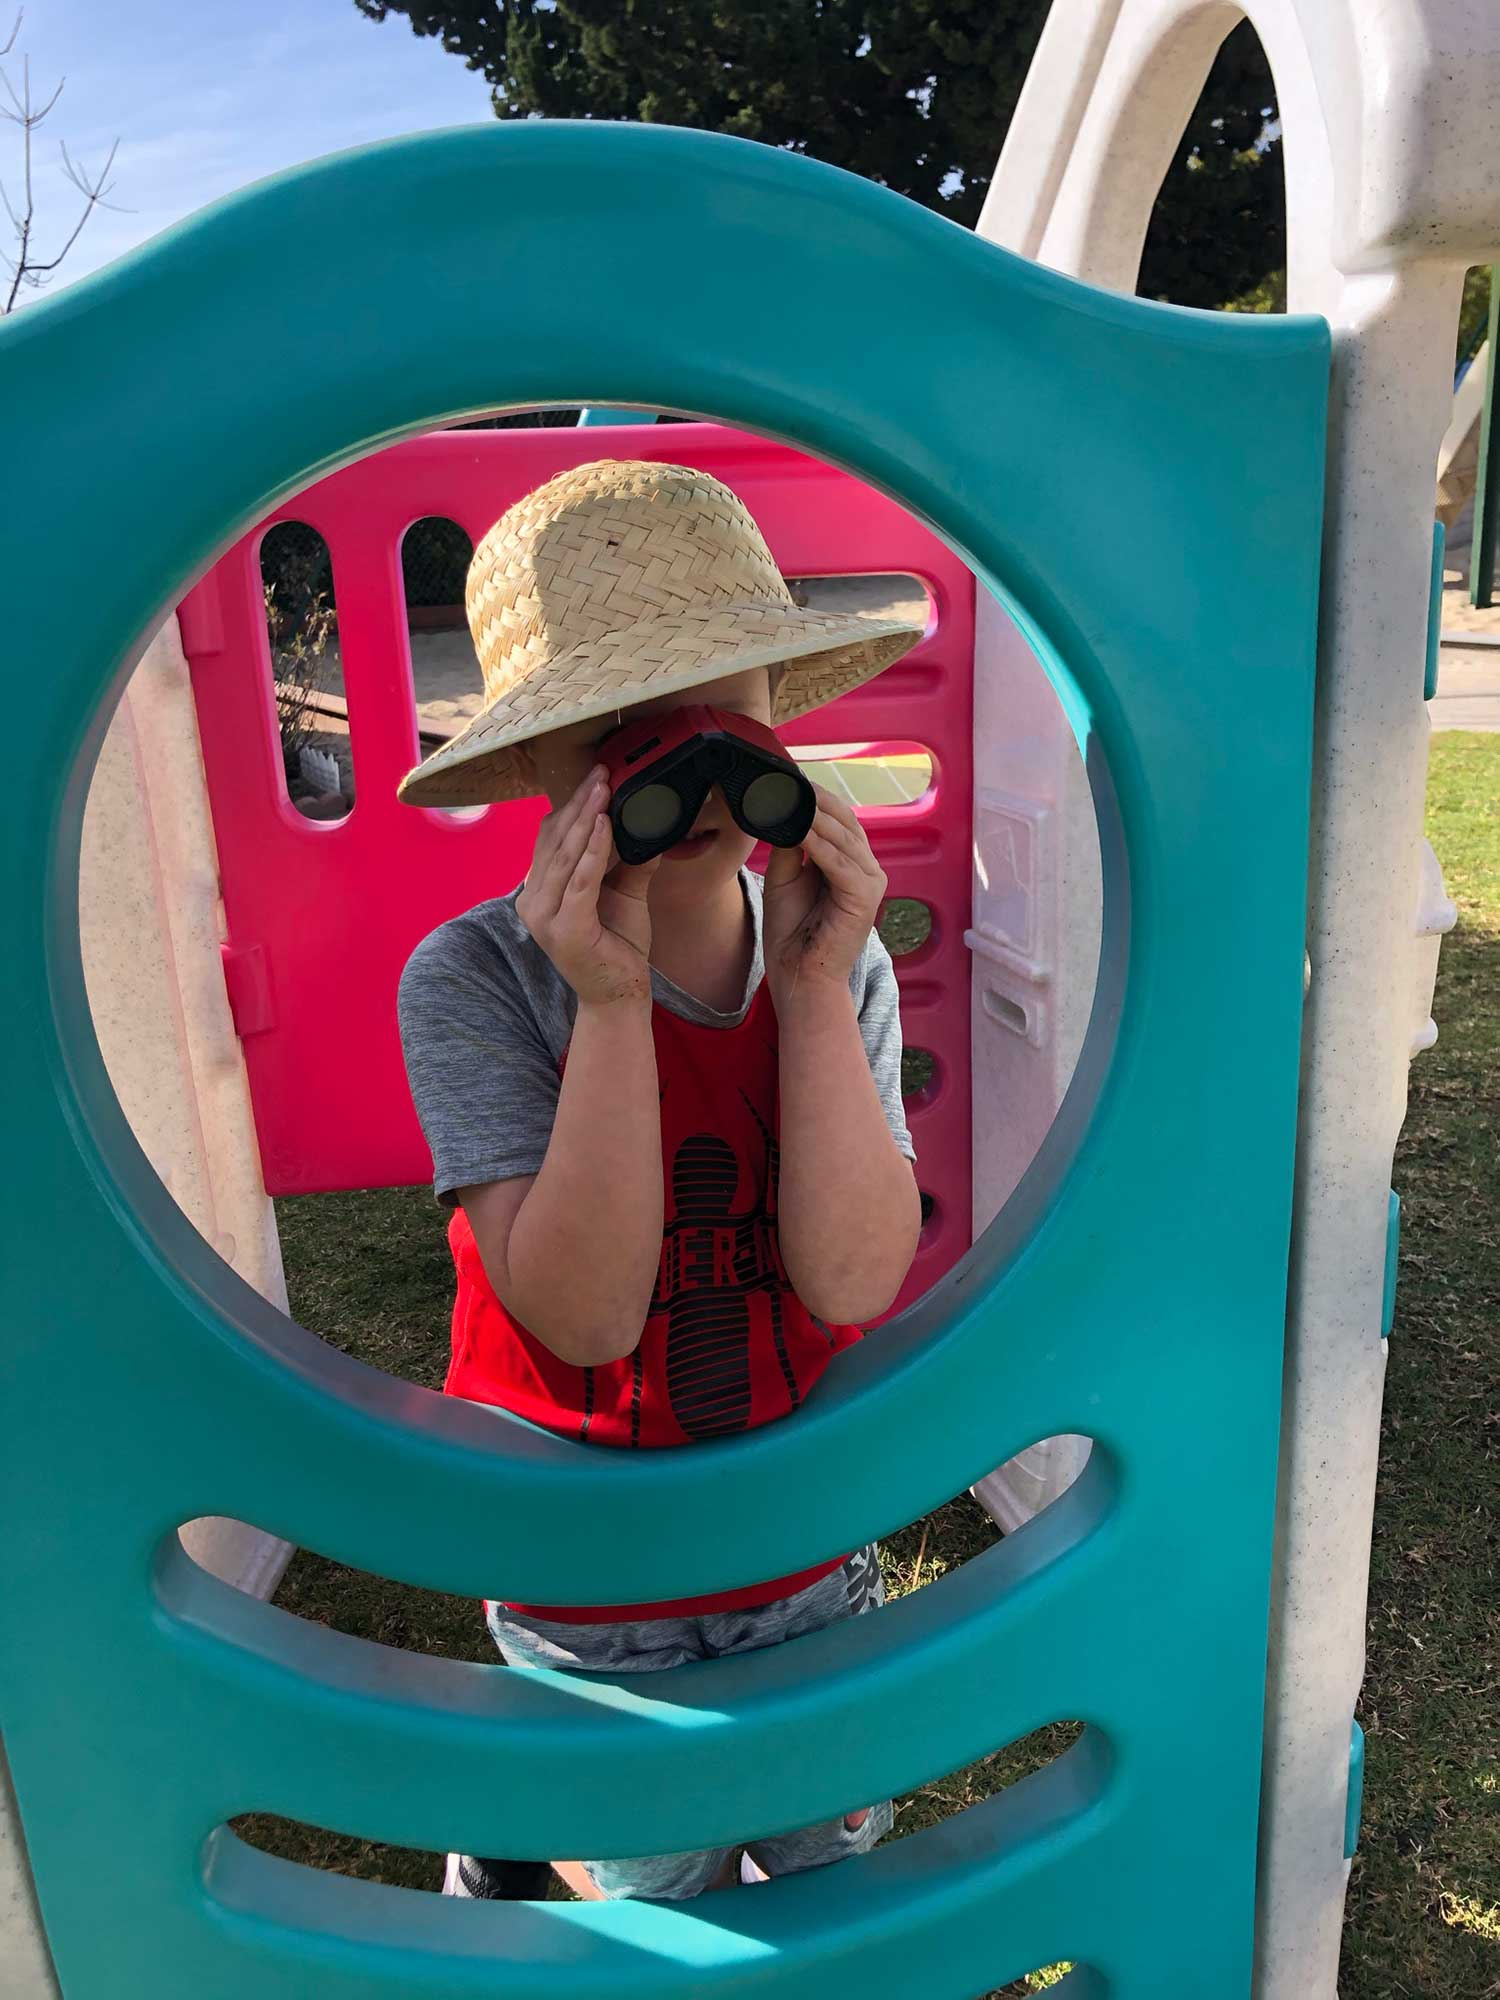 Child With Binoculars and Straw Hat